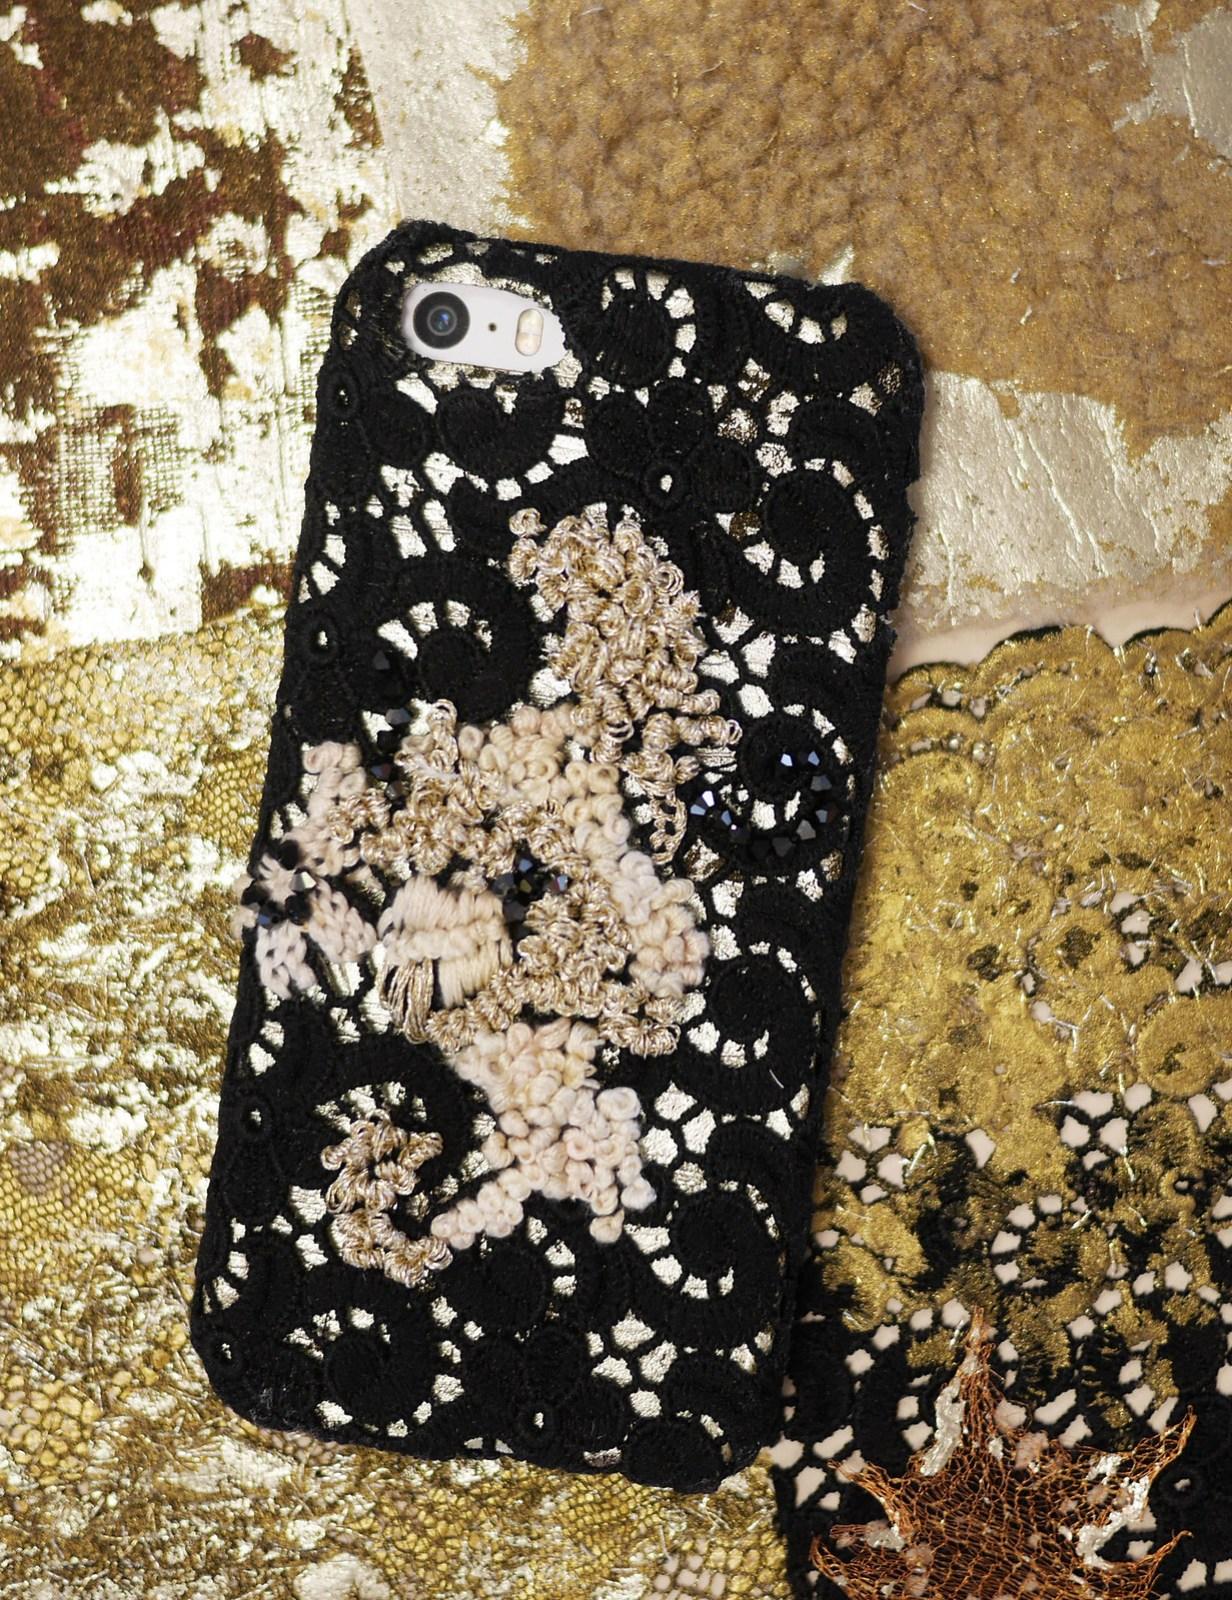 Couture Craftmanship - Haute Couture iphone